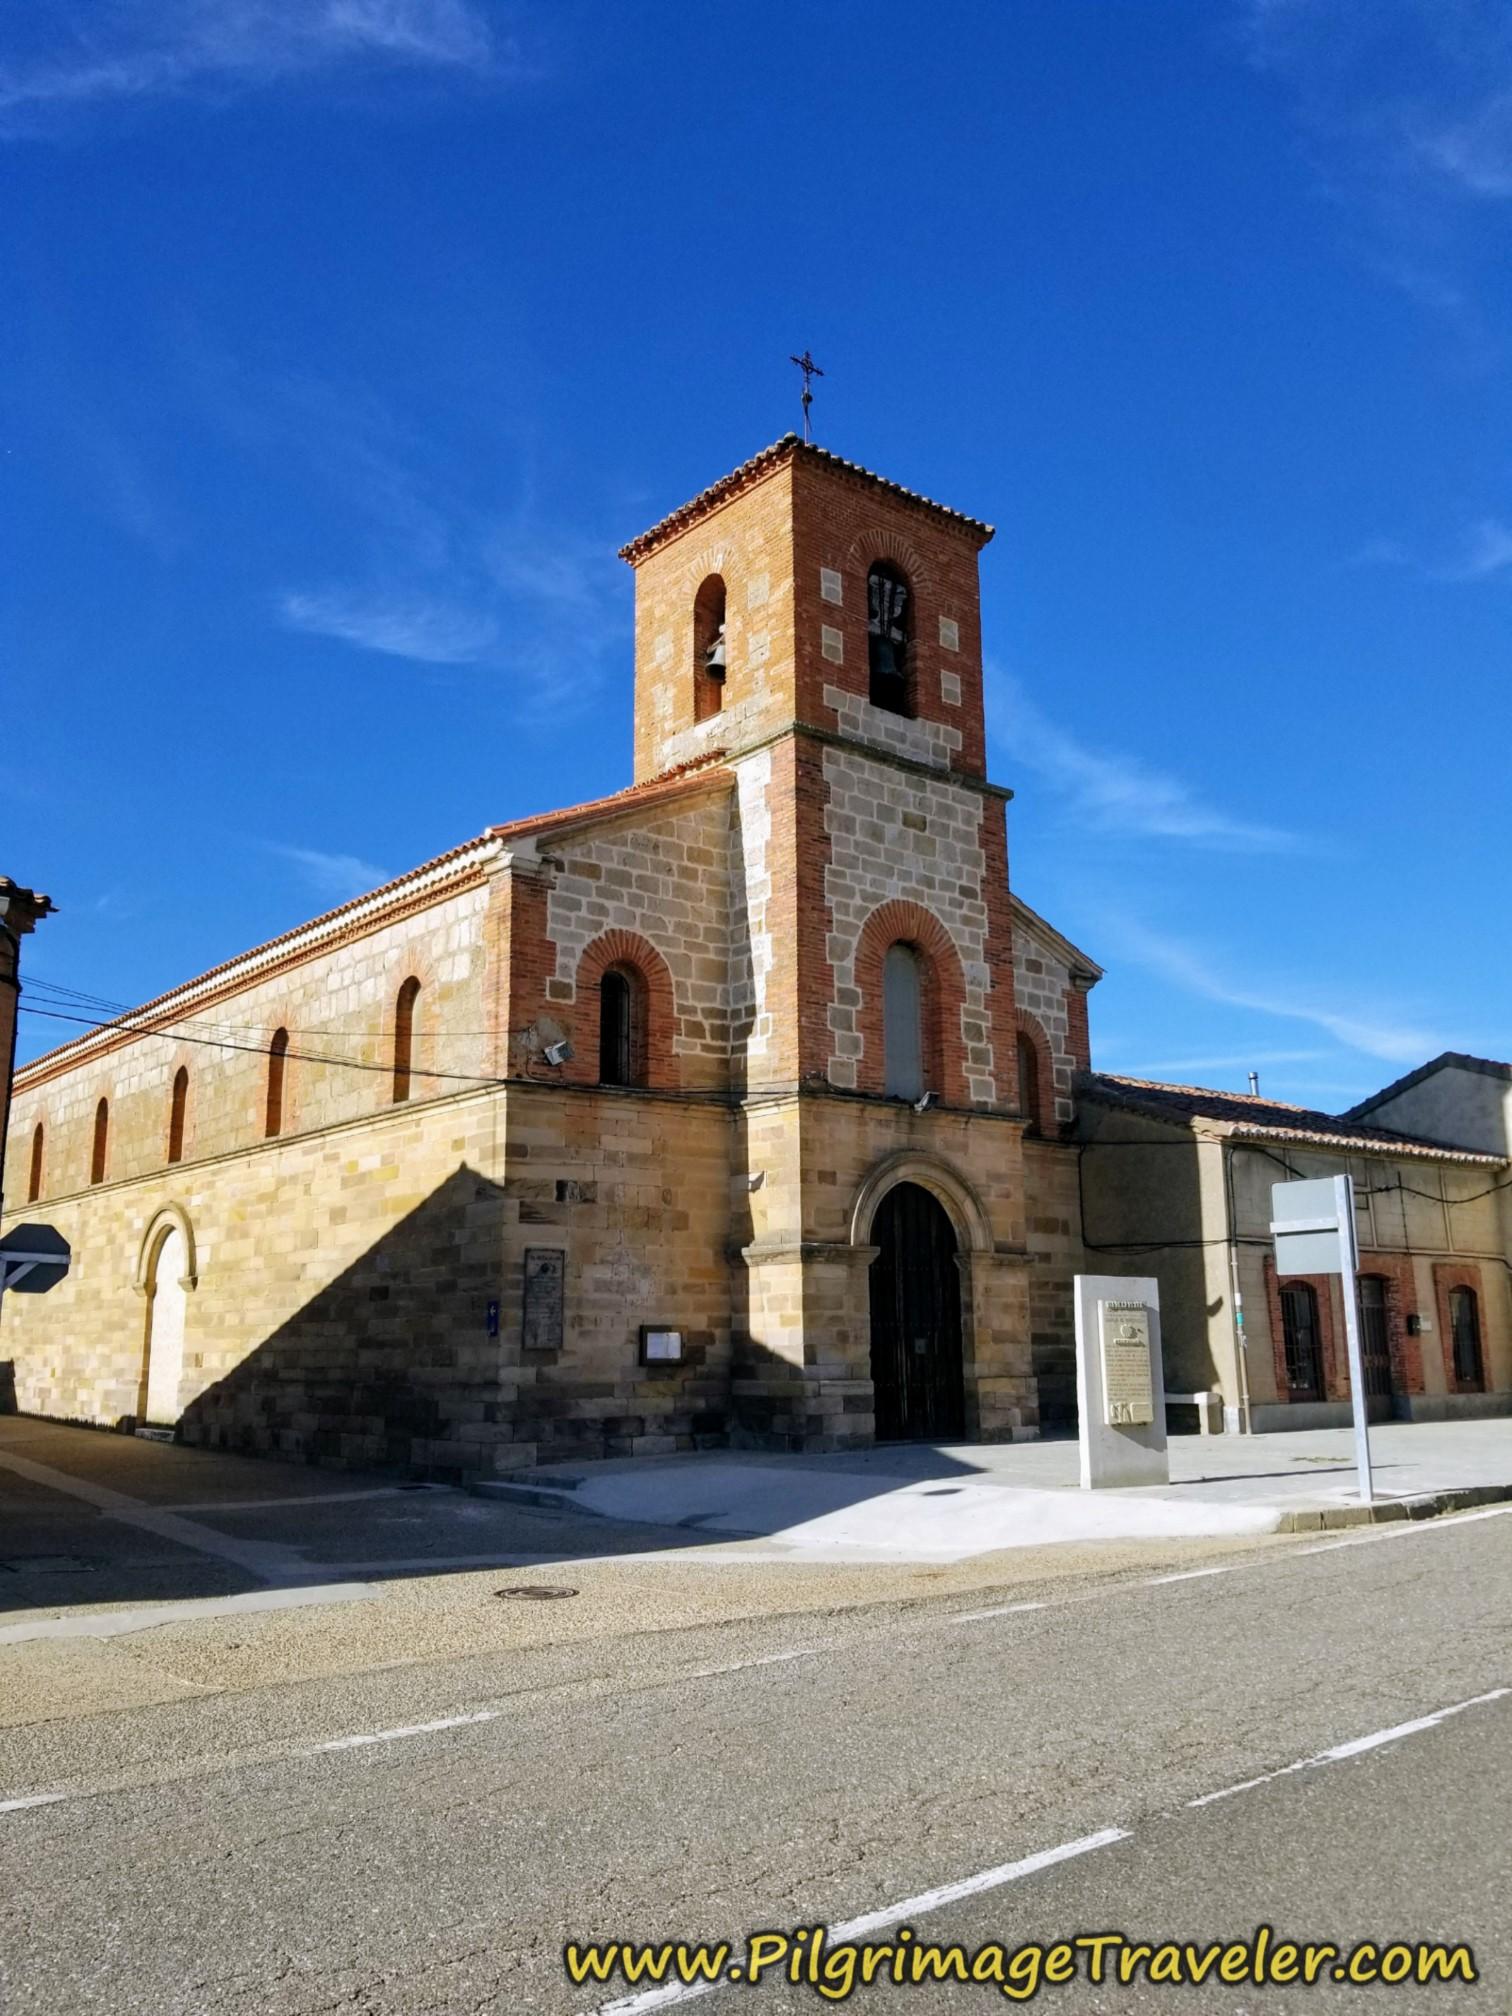 Town Church on the Vía de la Plata from Montamarta to Granja de Moreruela